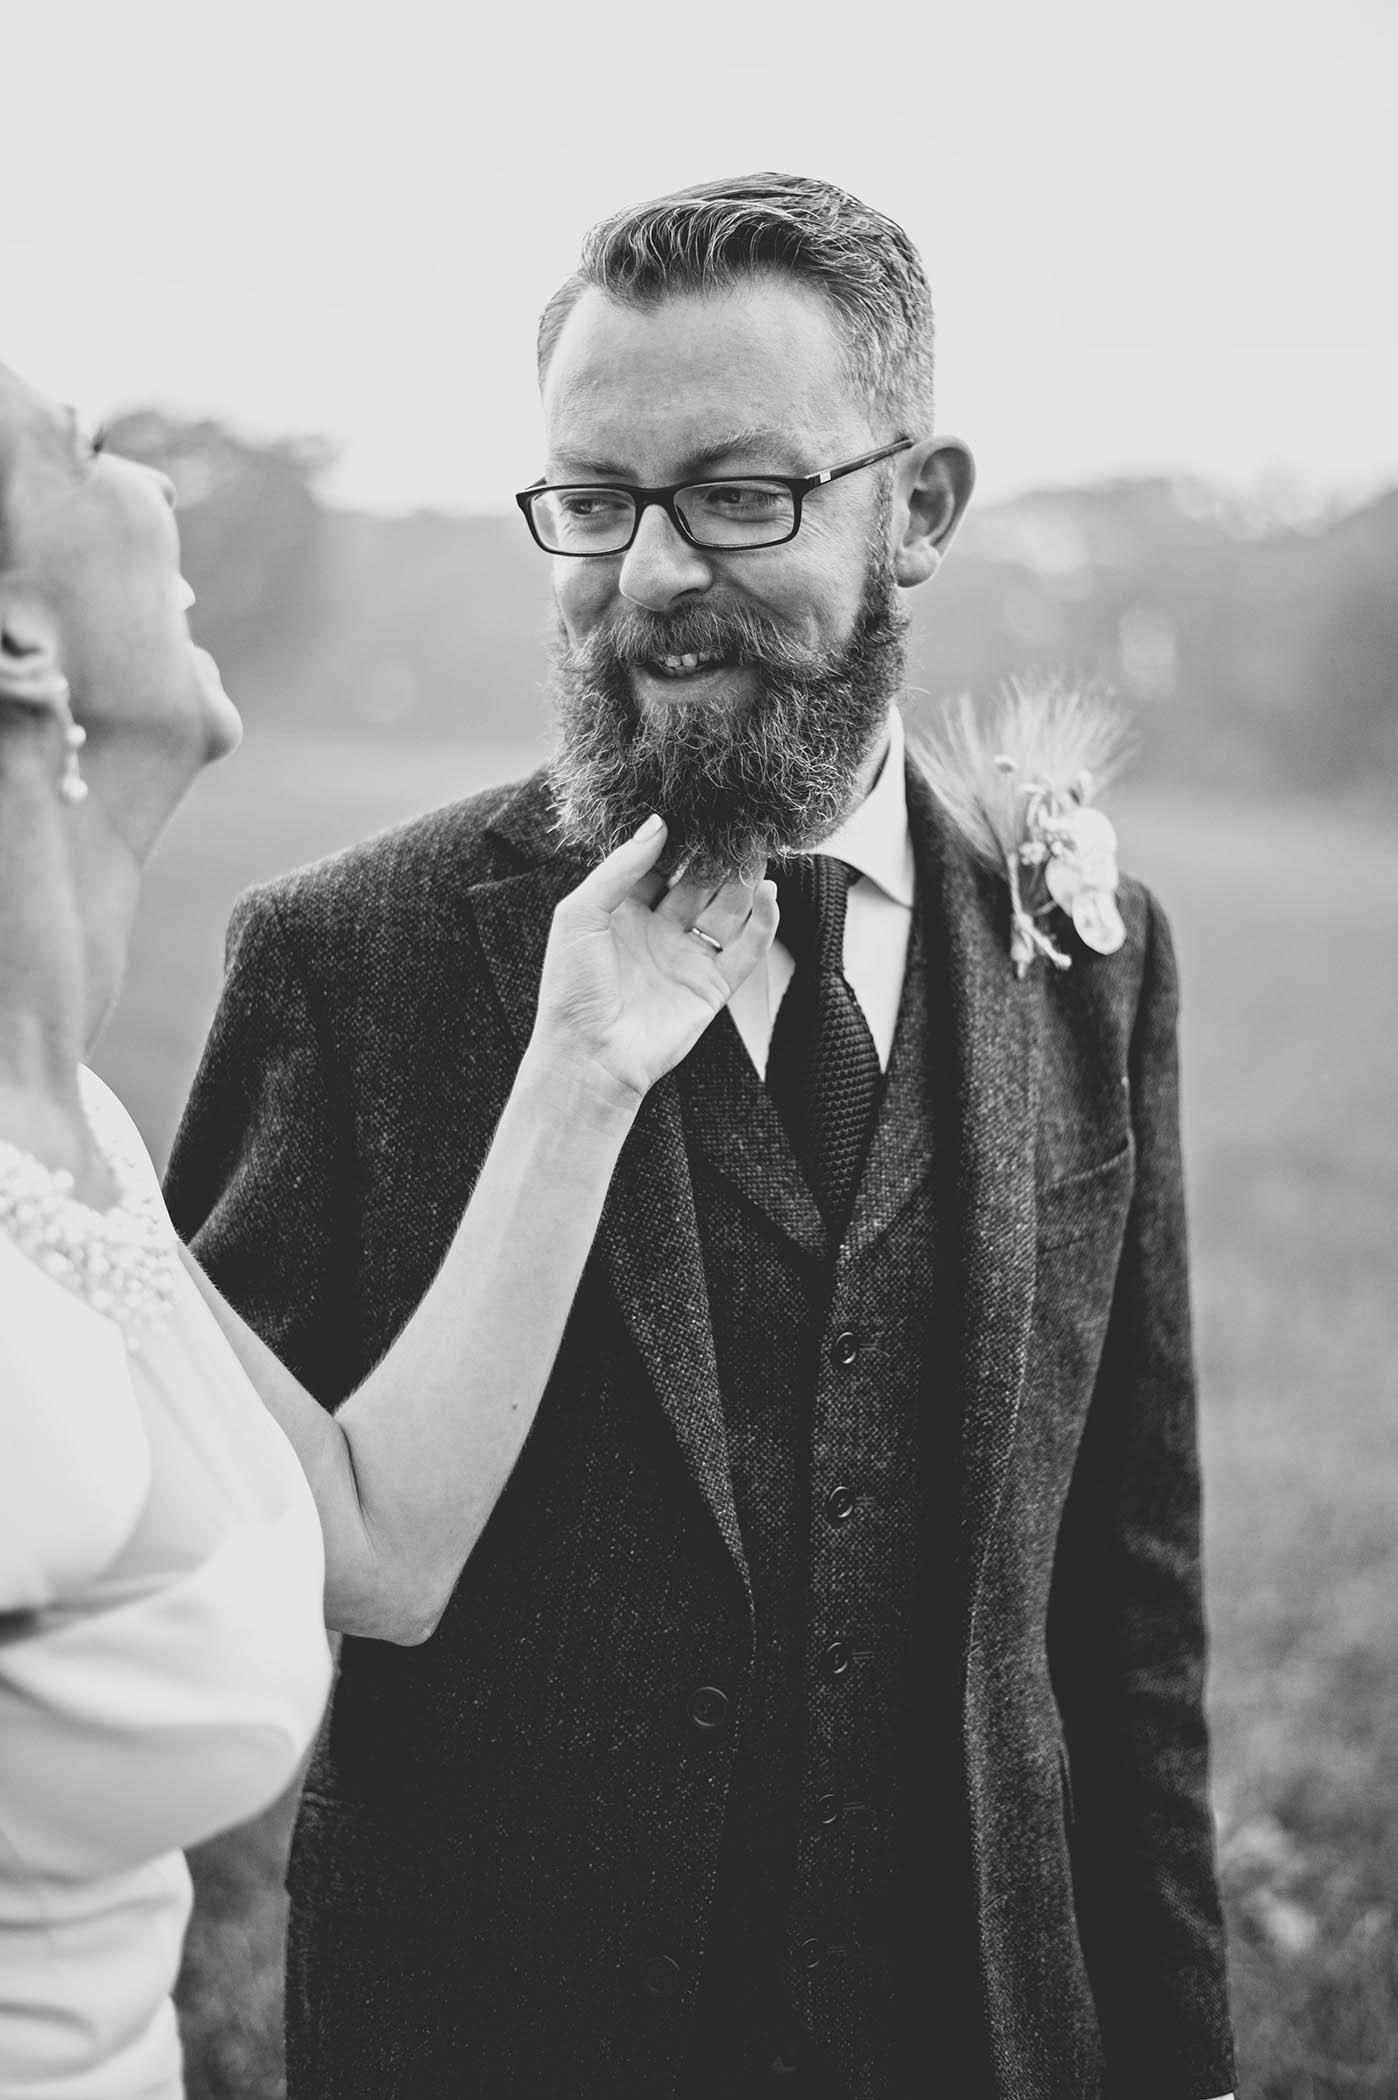 Borris House 2014, tender moment between bride and groom